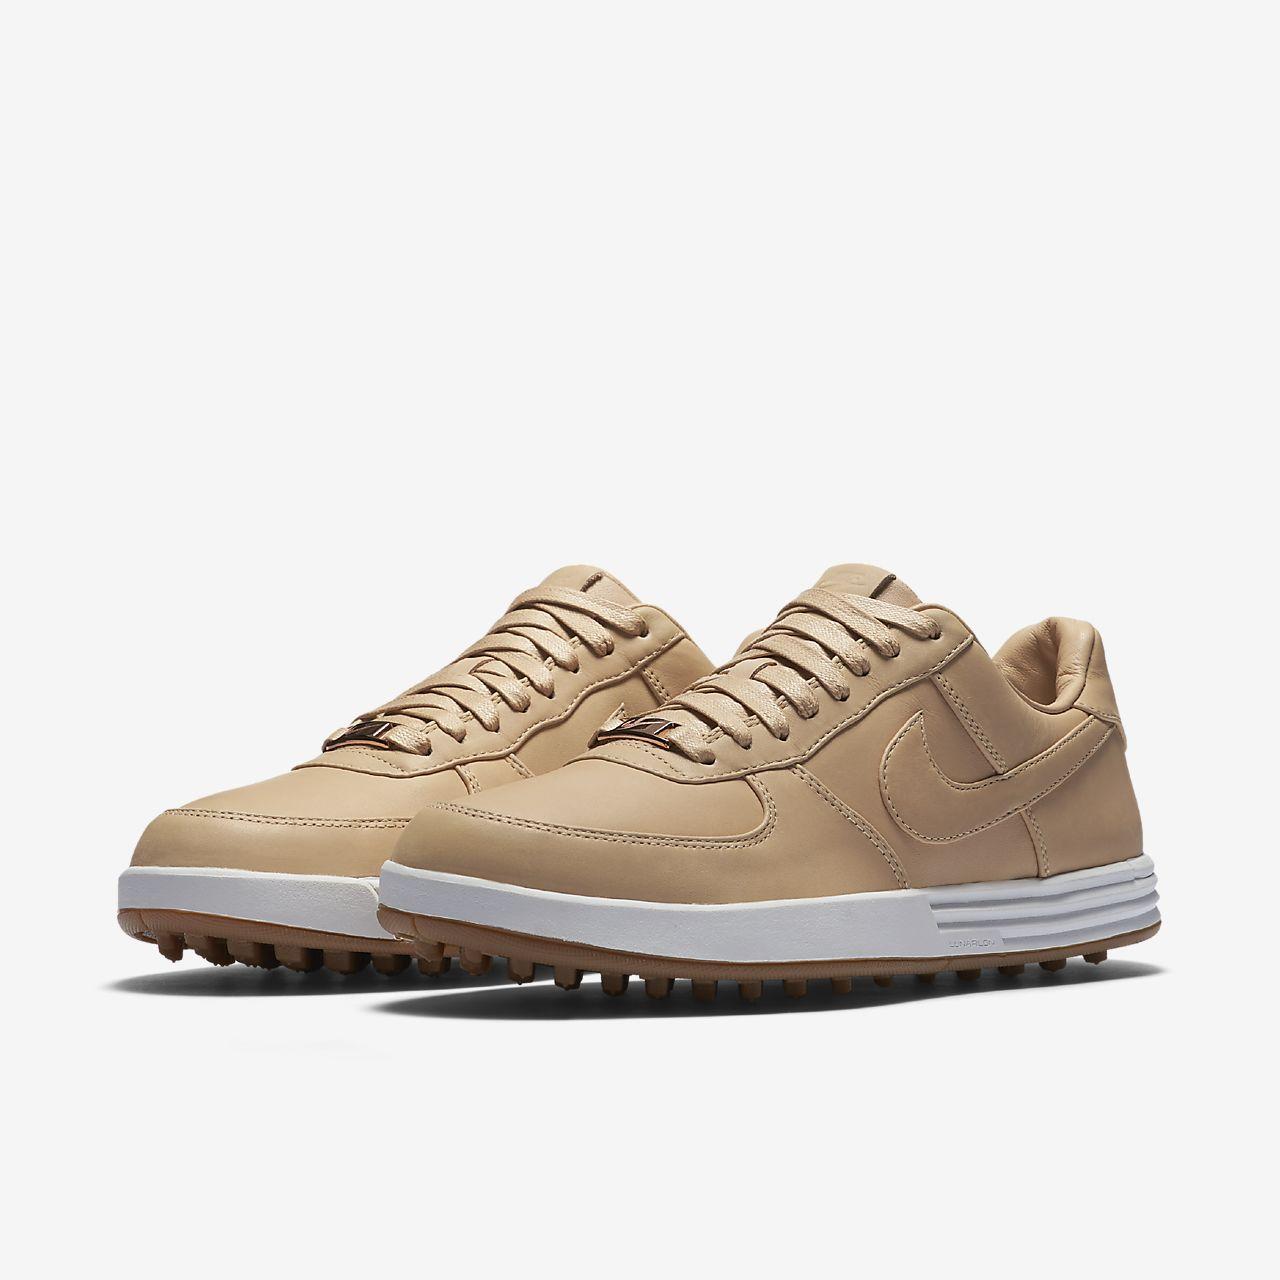 ... Nike Lunar Force 1 G Premium Mens Golf Shoe